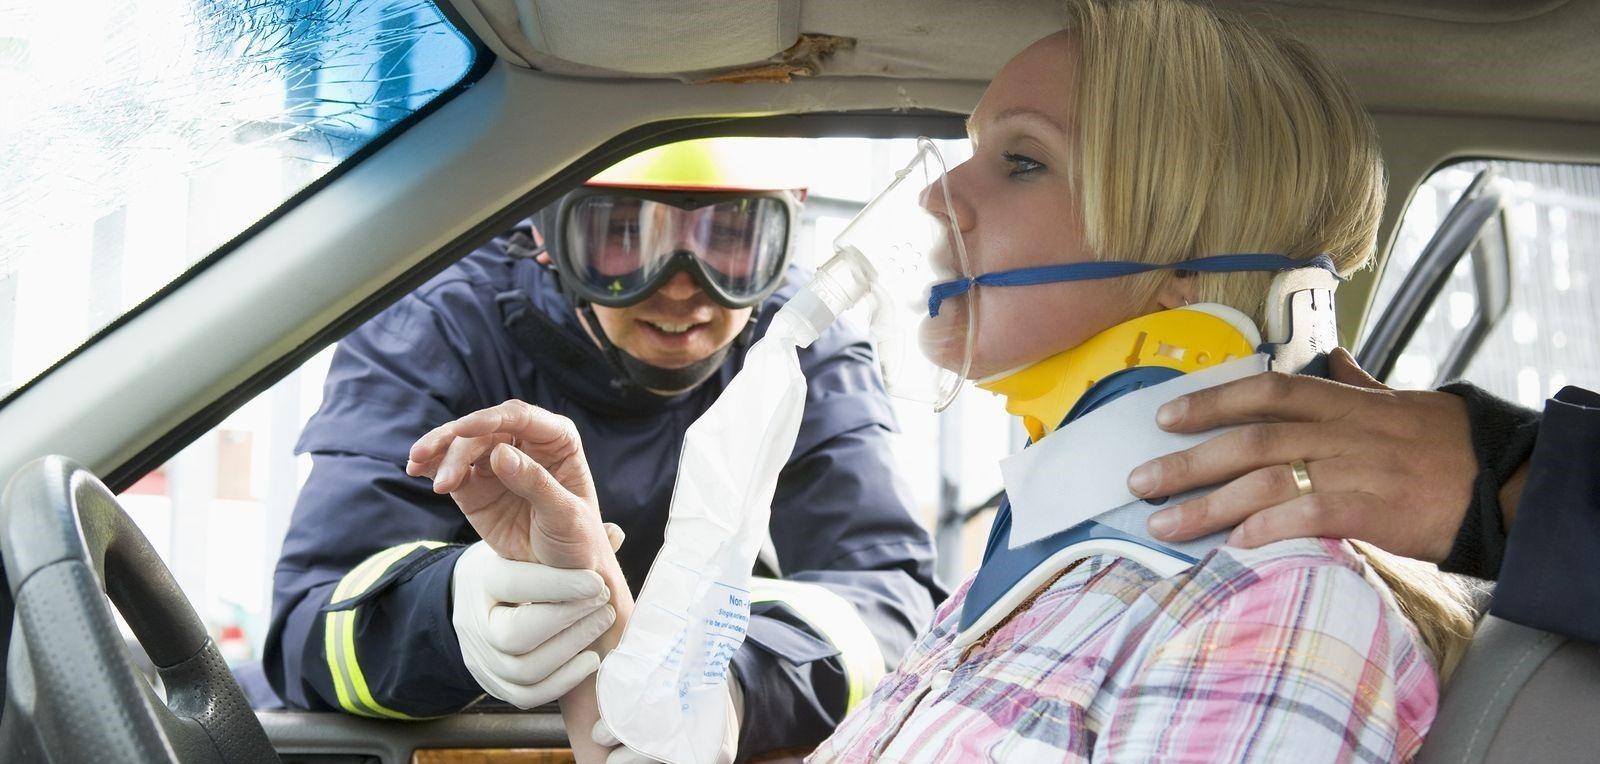 car-accident-injuries+%281%29.jpg